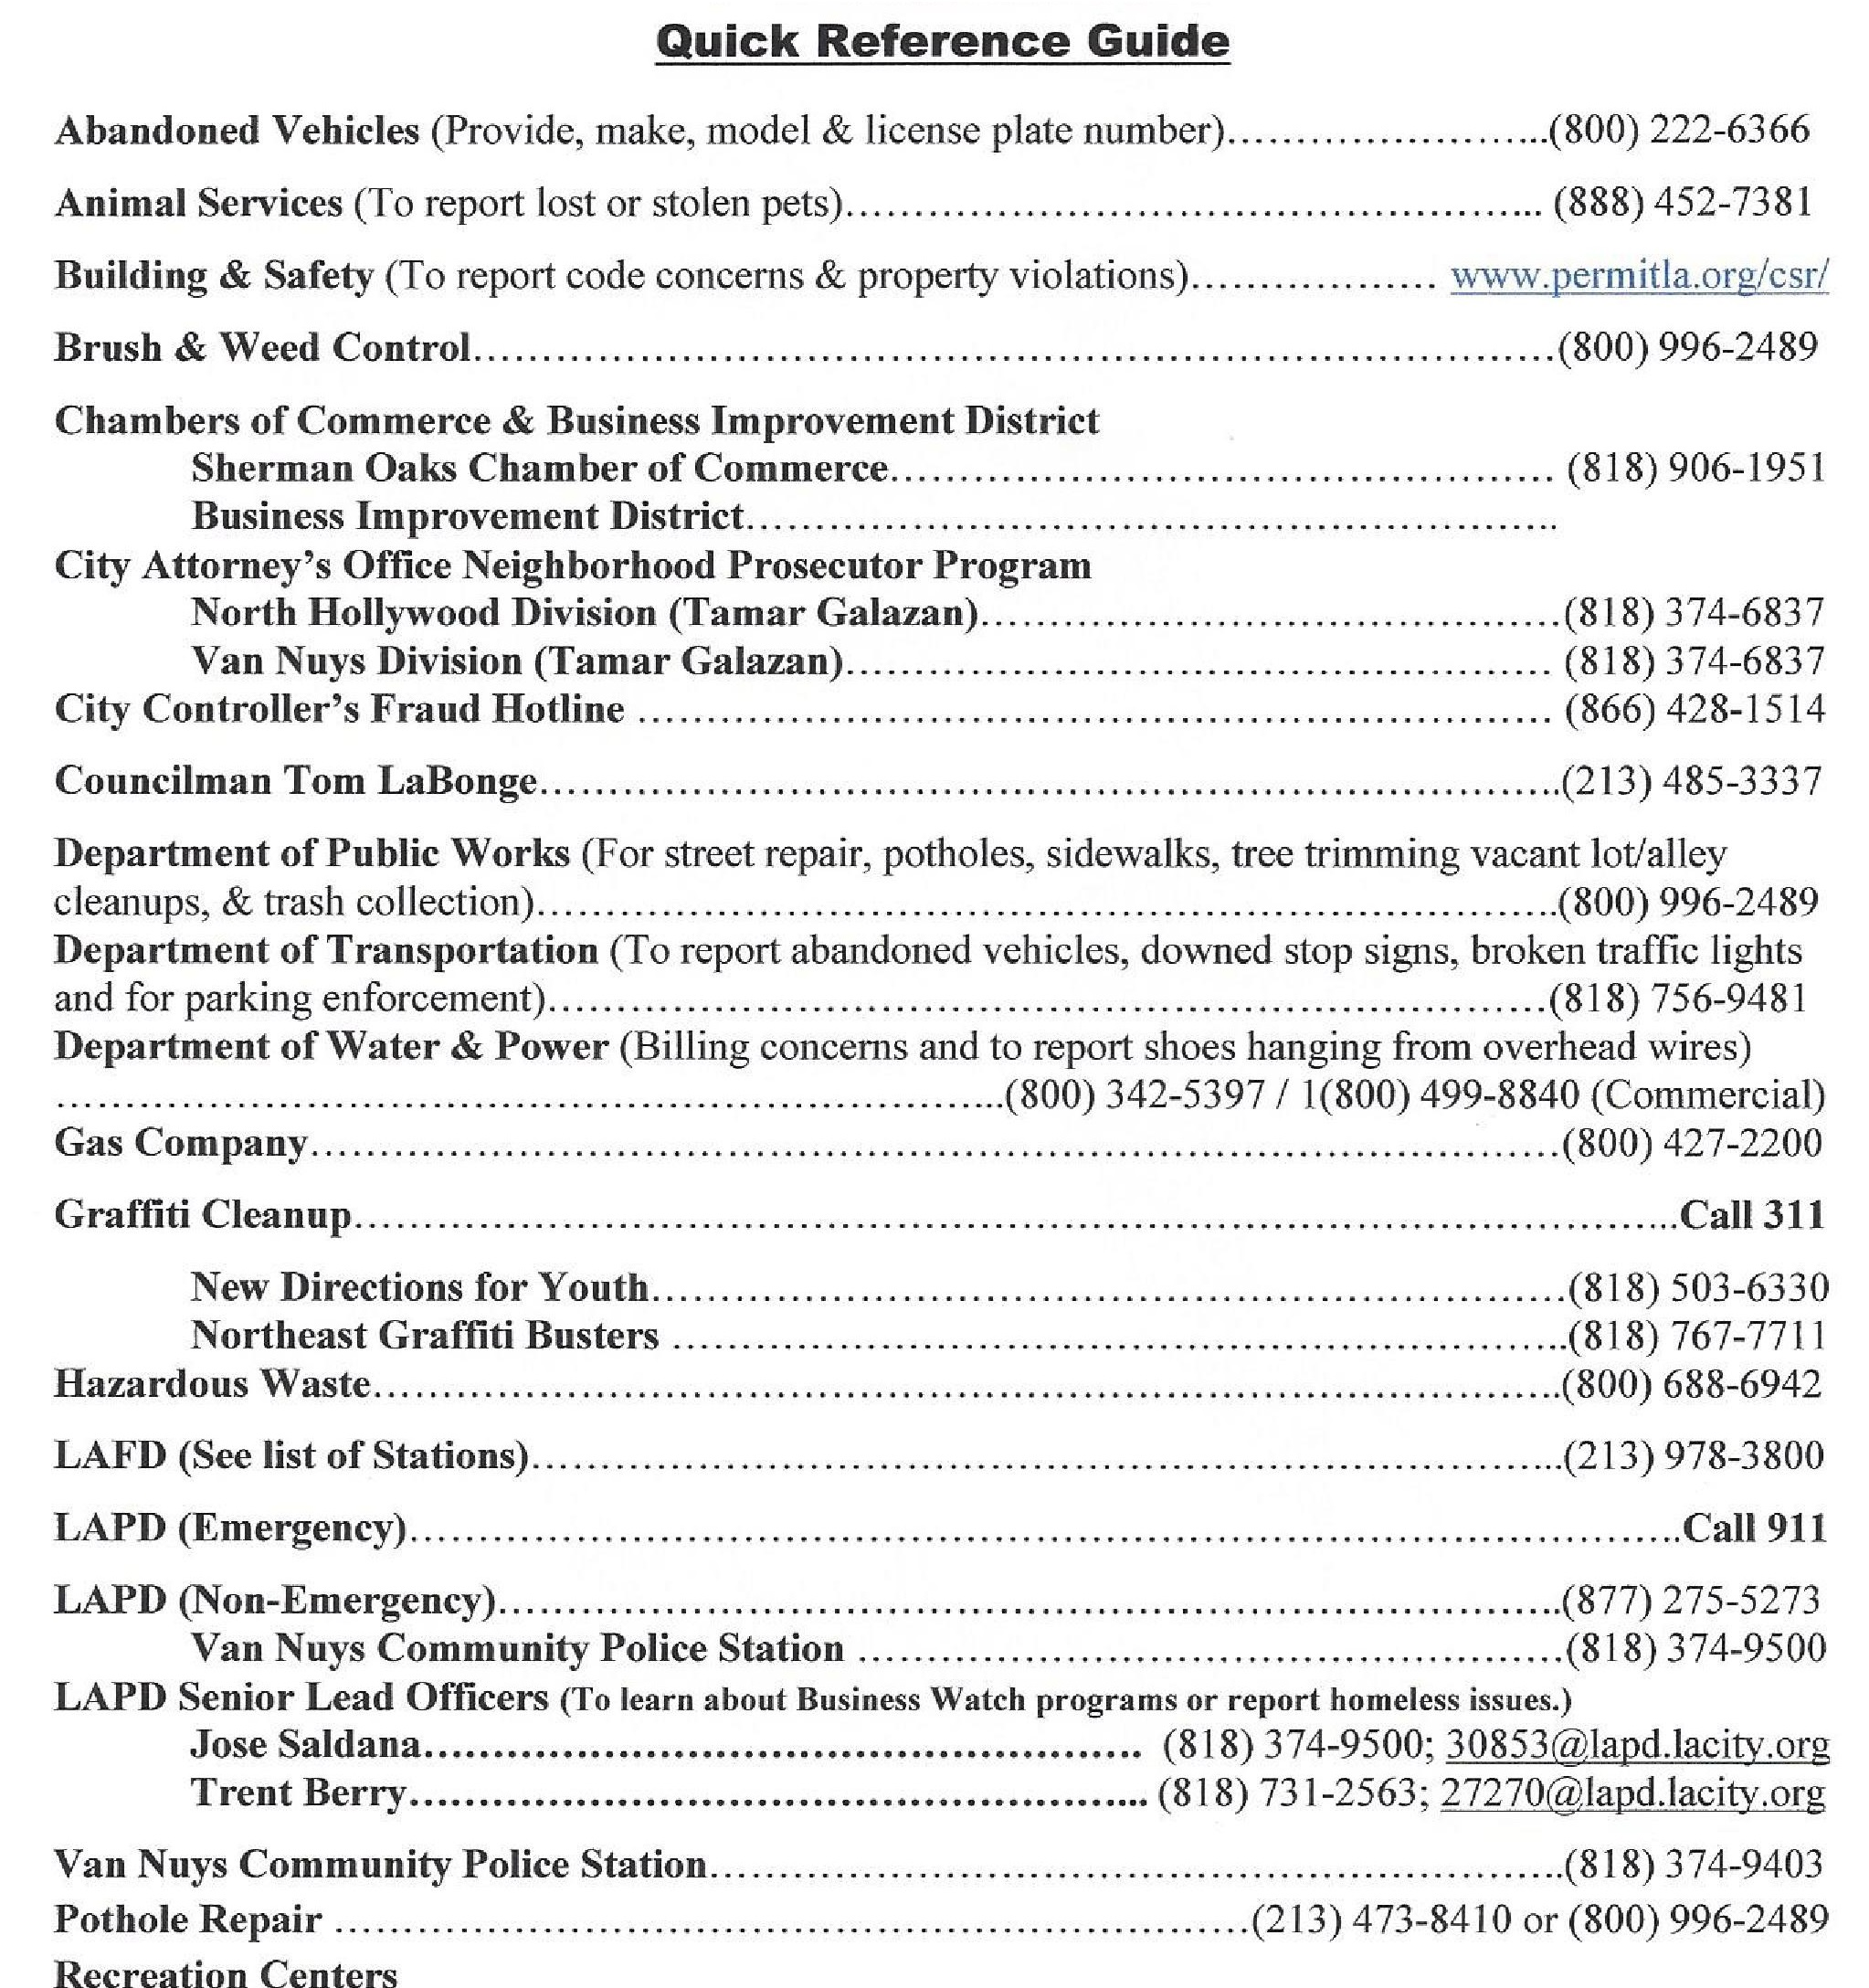 sherman oaks resources, sherman oaks chamber of commerce, organizations, community organizations, sherman oaks phone numbers, helpful numbers